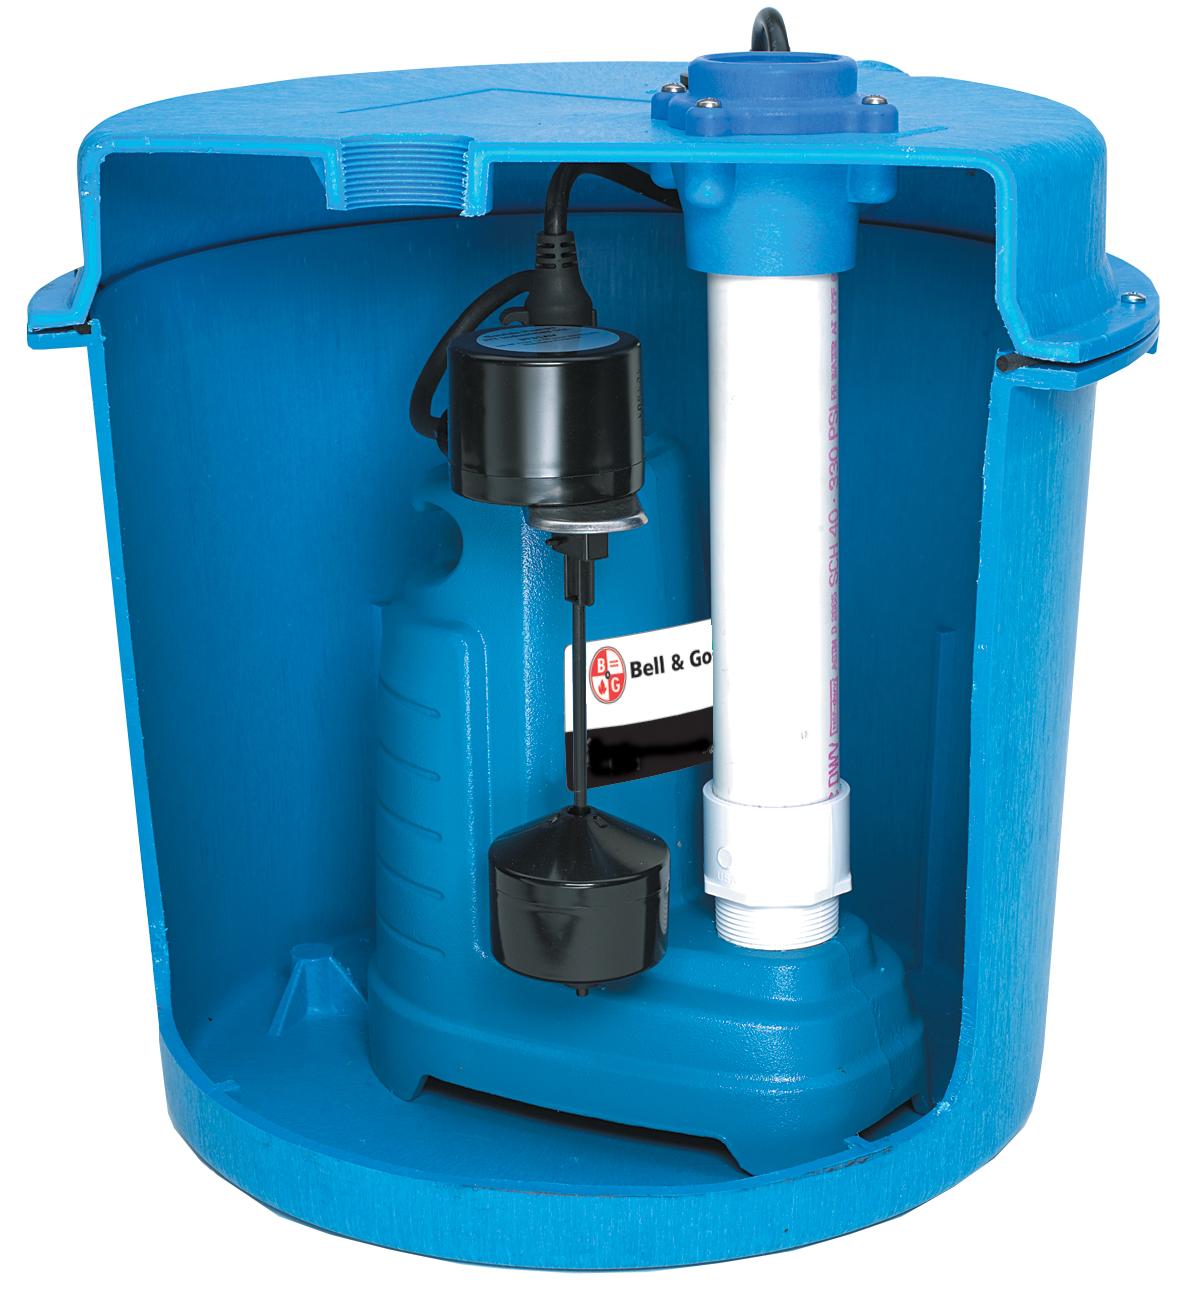 MSDS-Sink Drain System – OBSOLETE